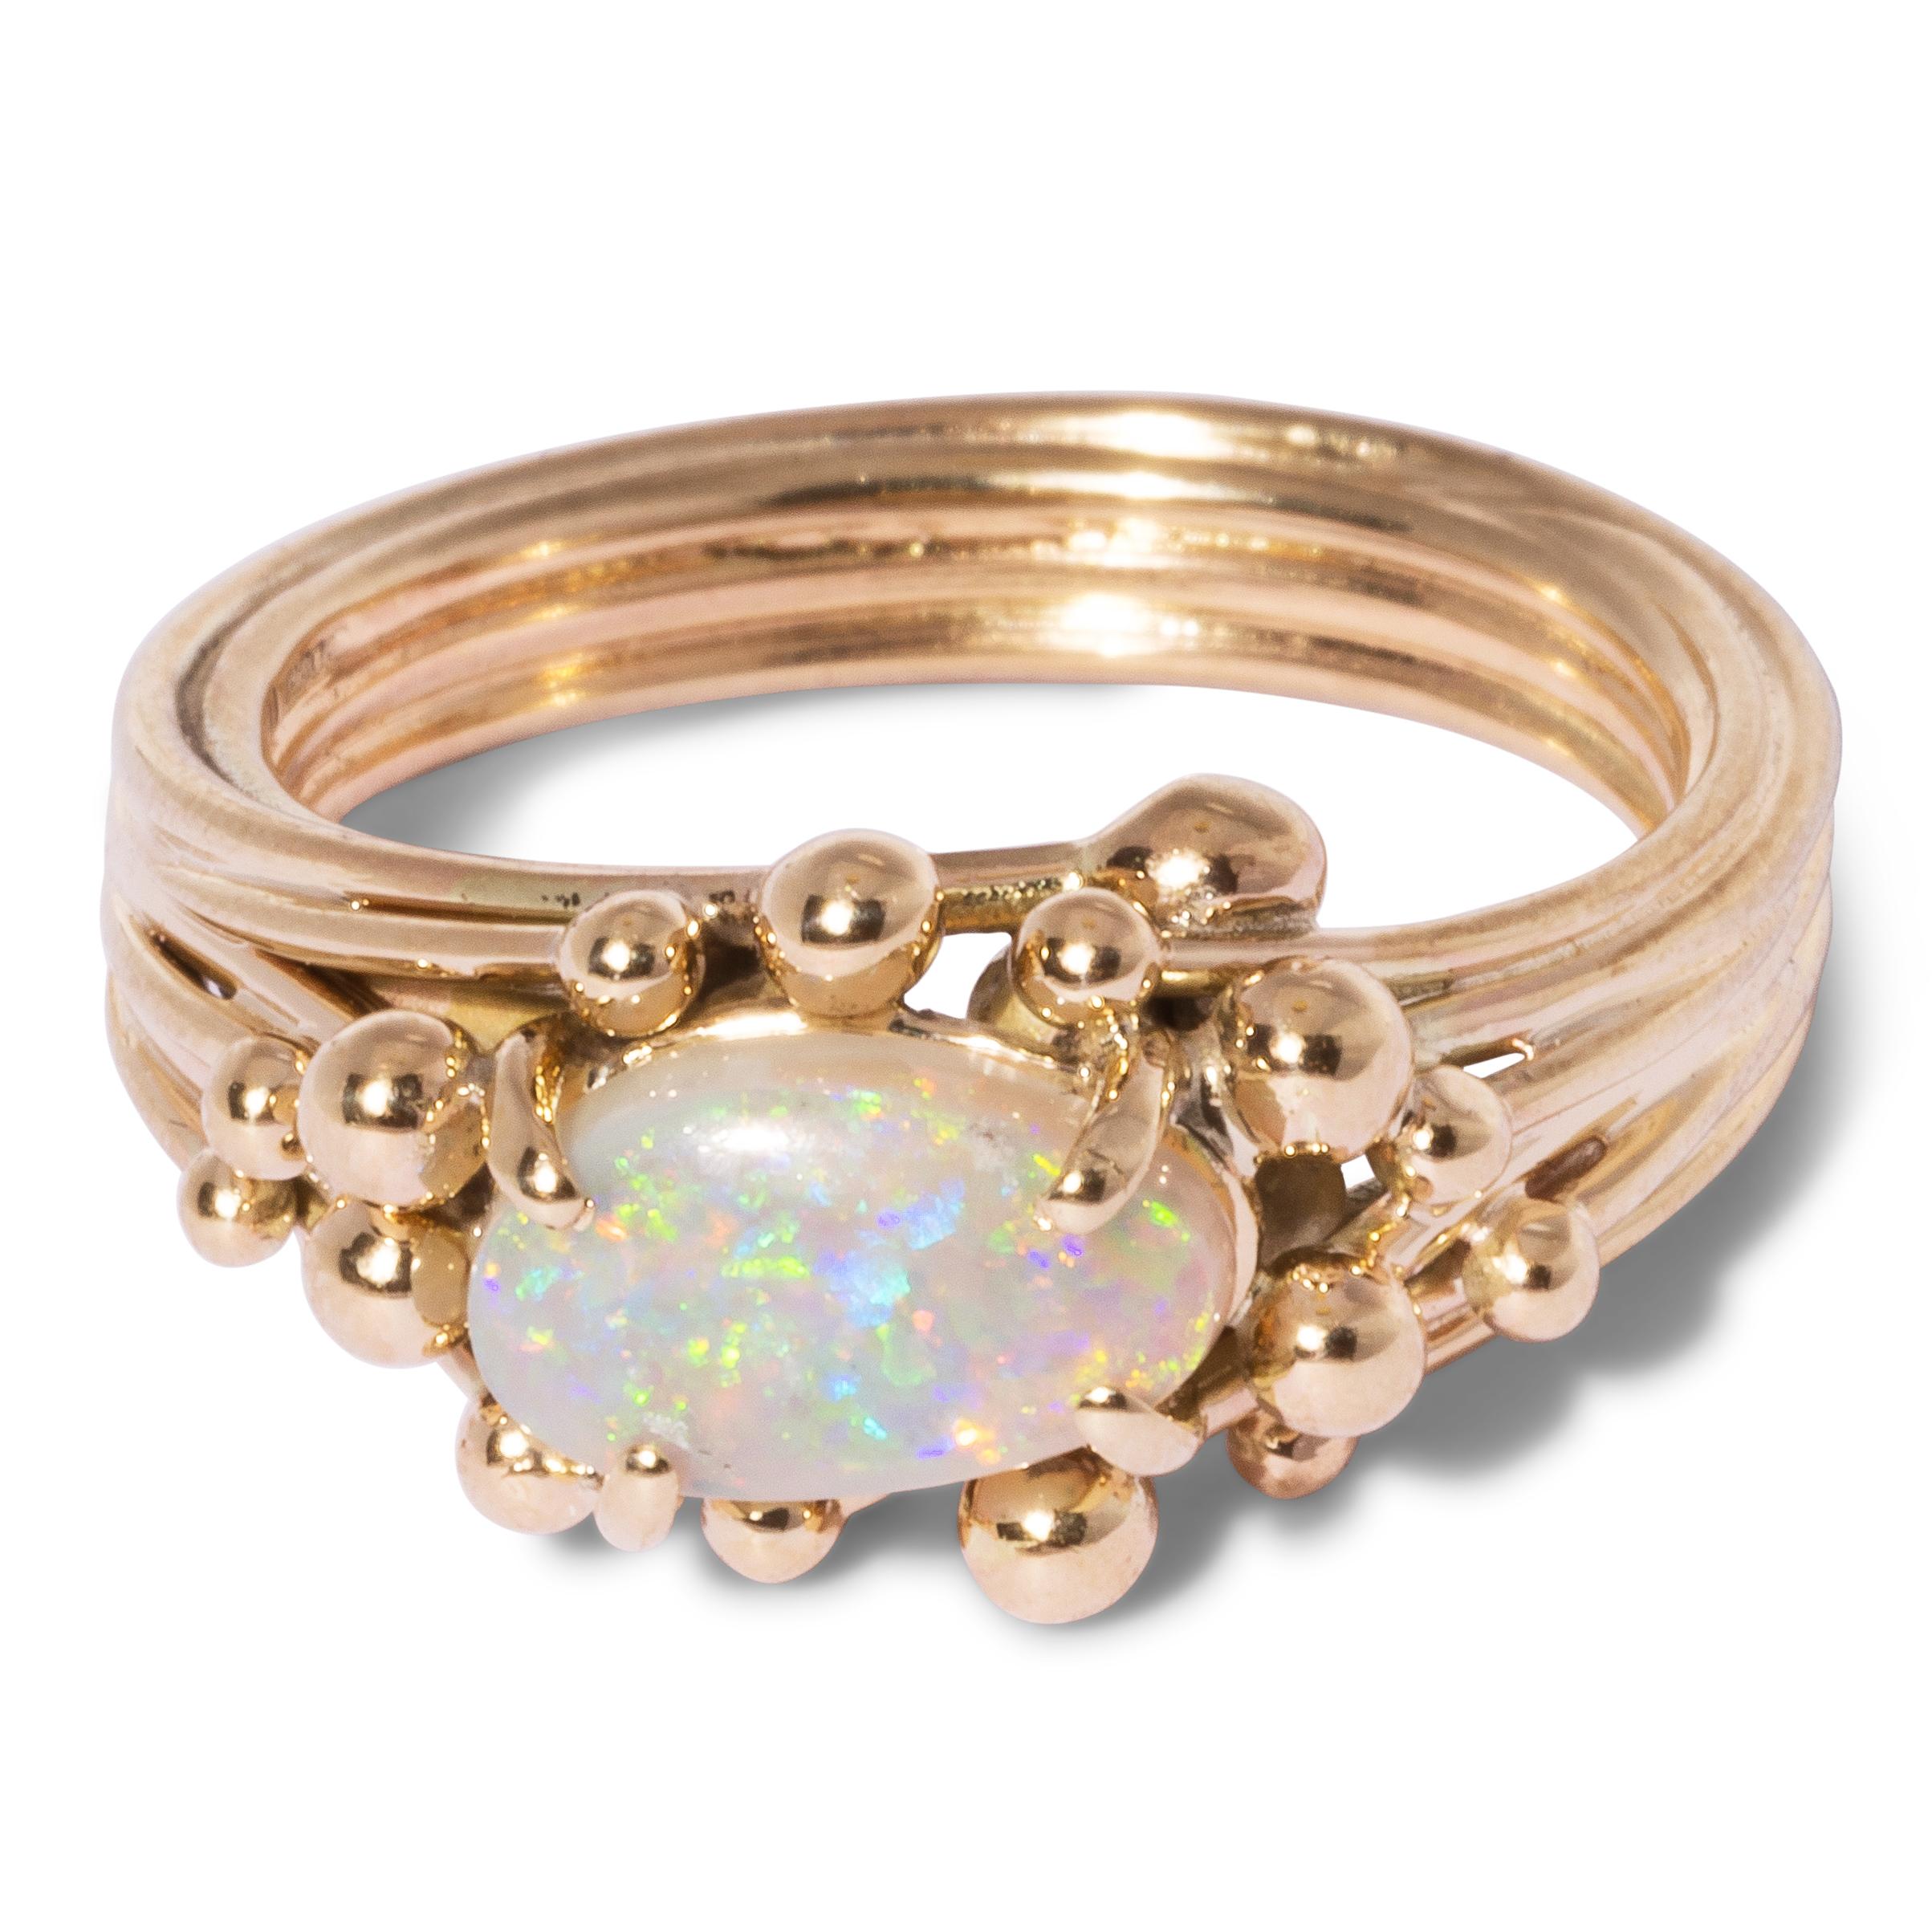 Yen Jewellery 18ct gold ring